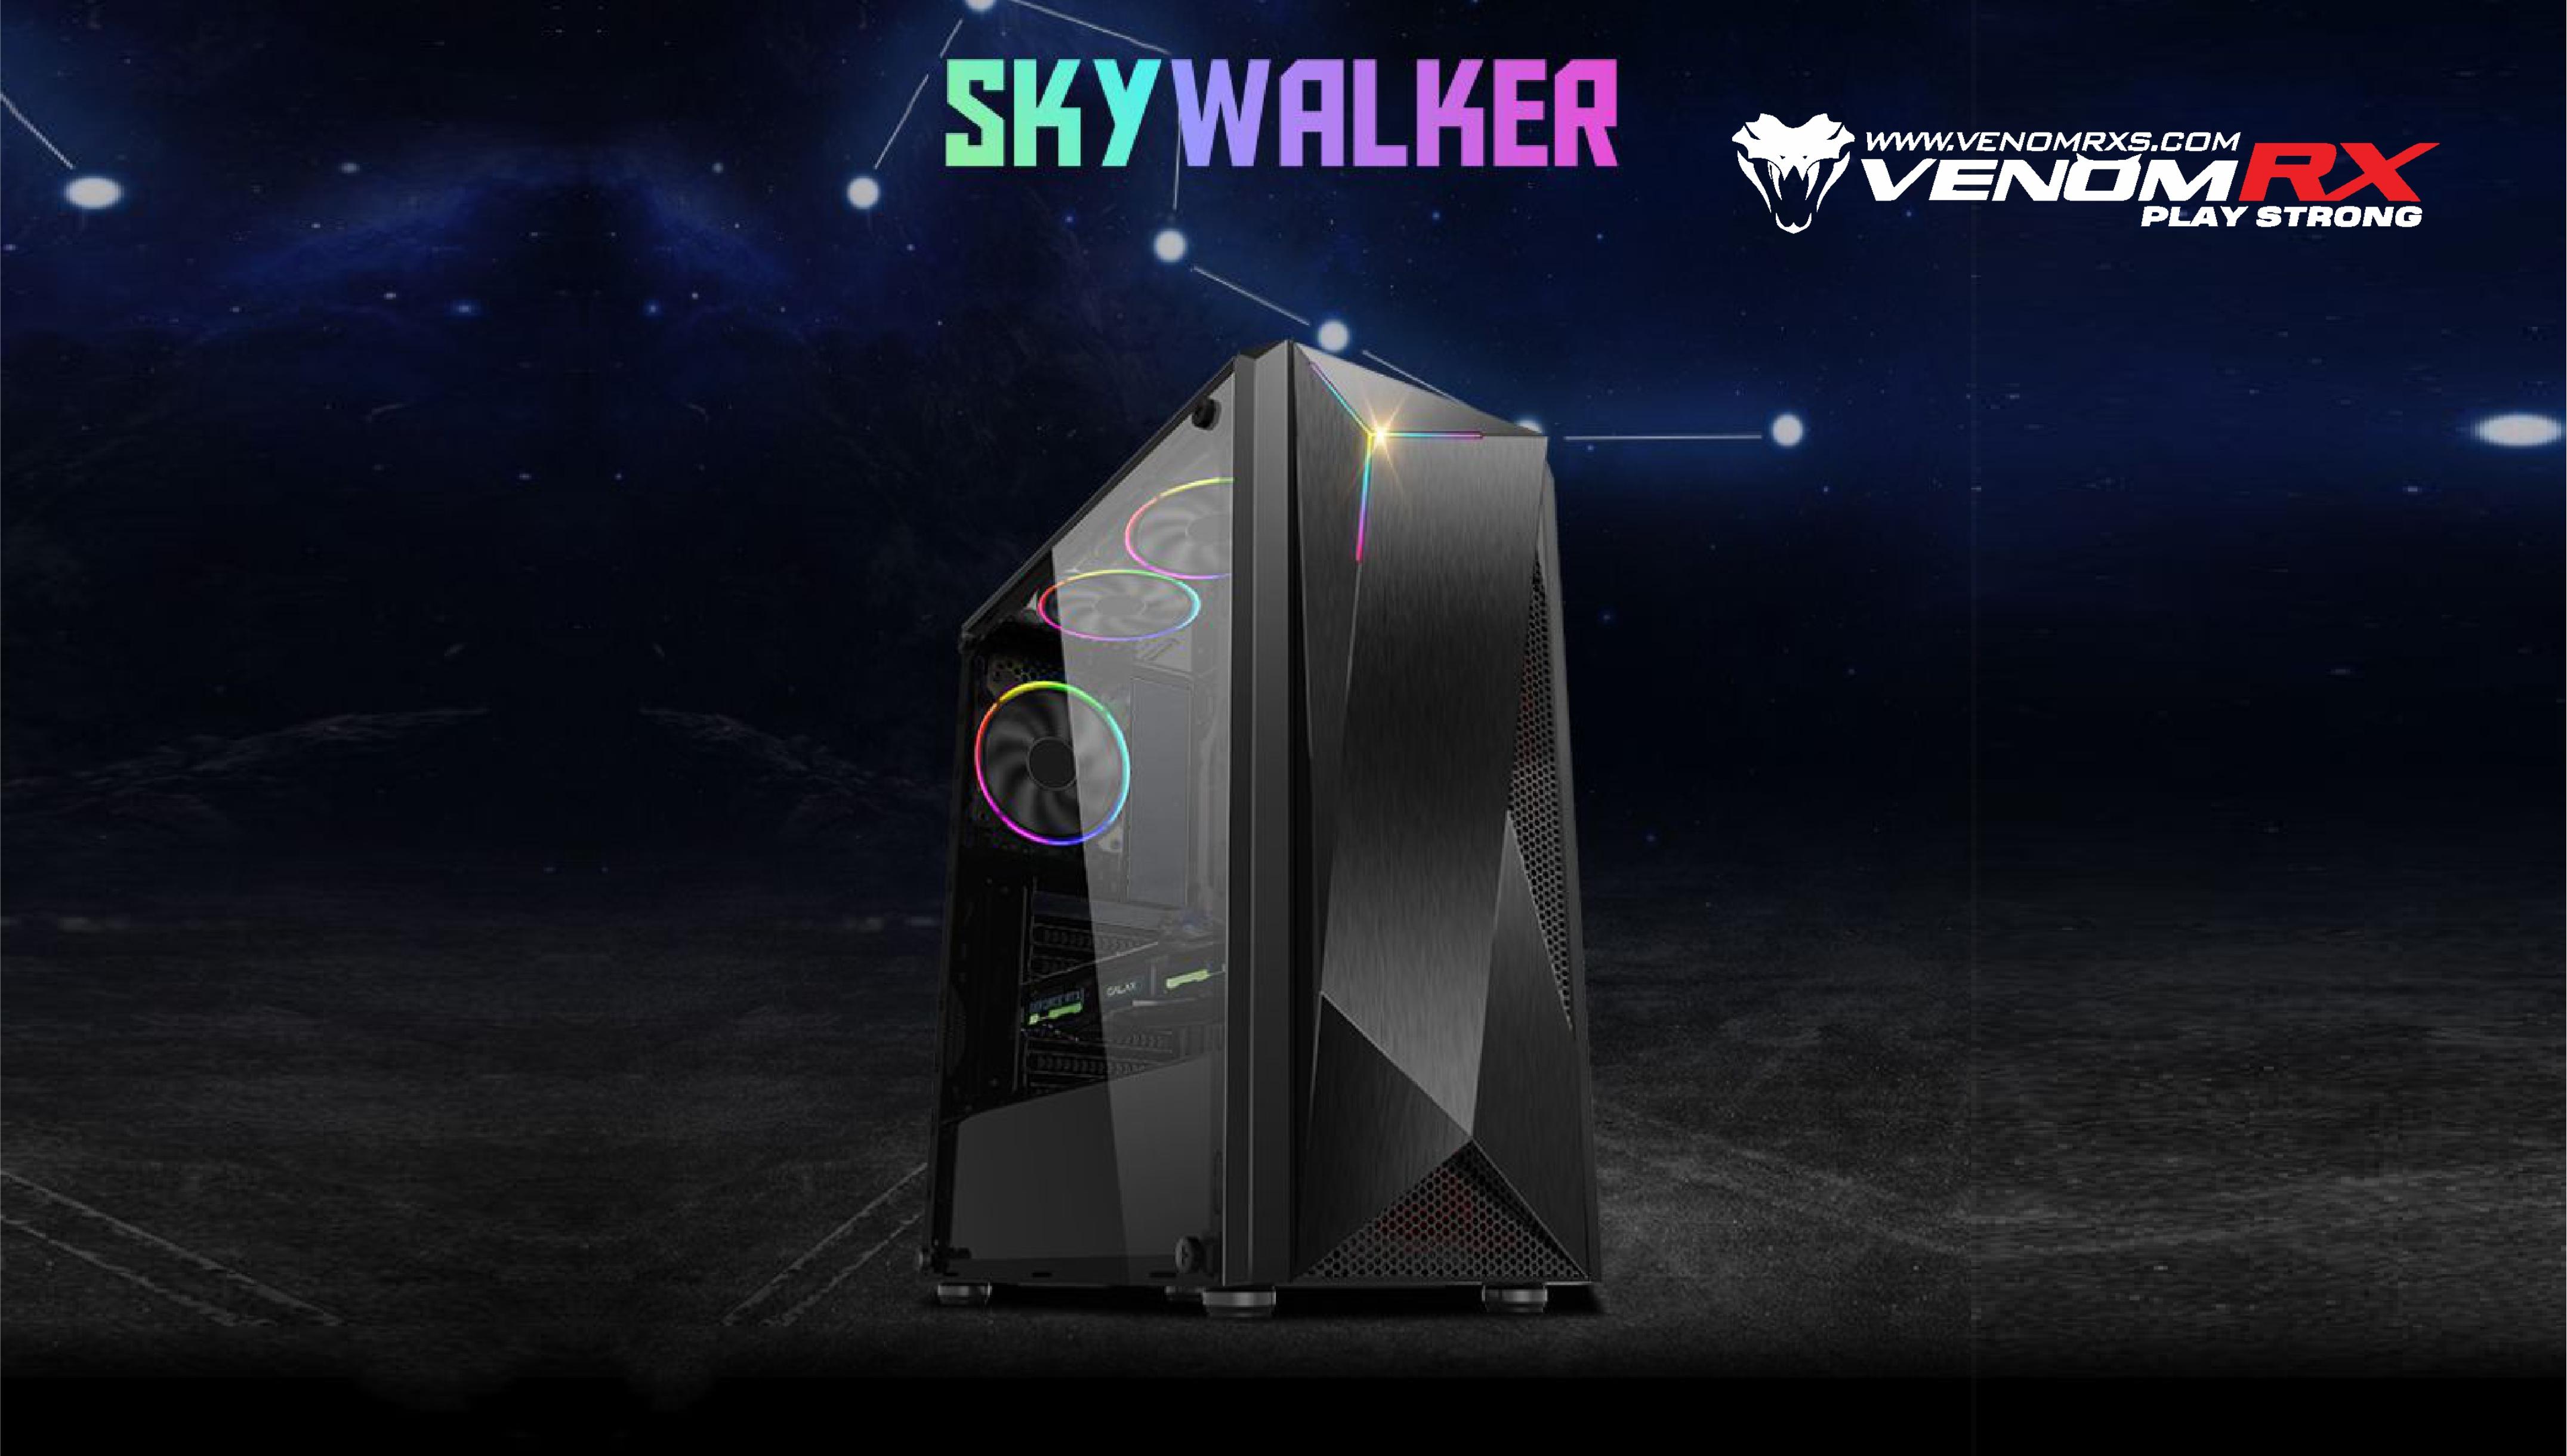 skywalker1 home